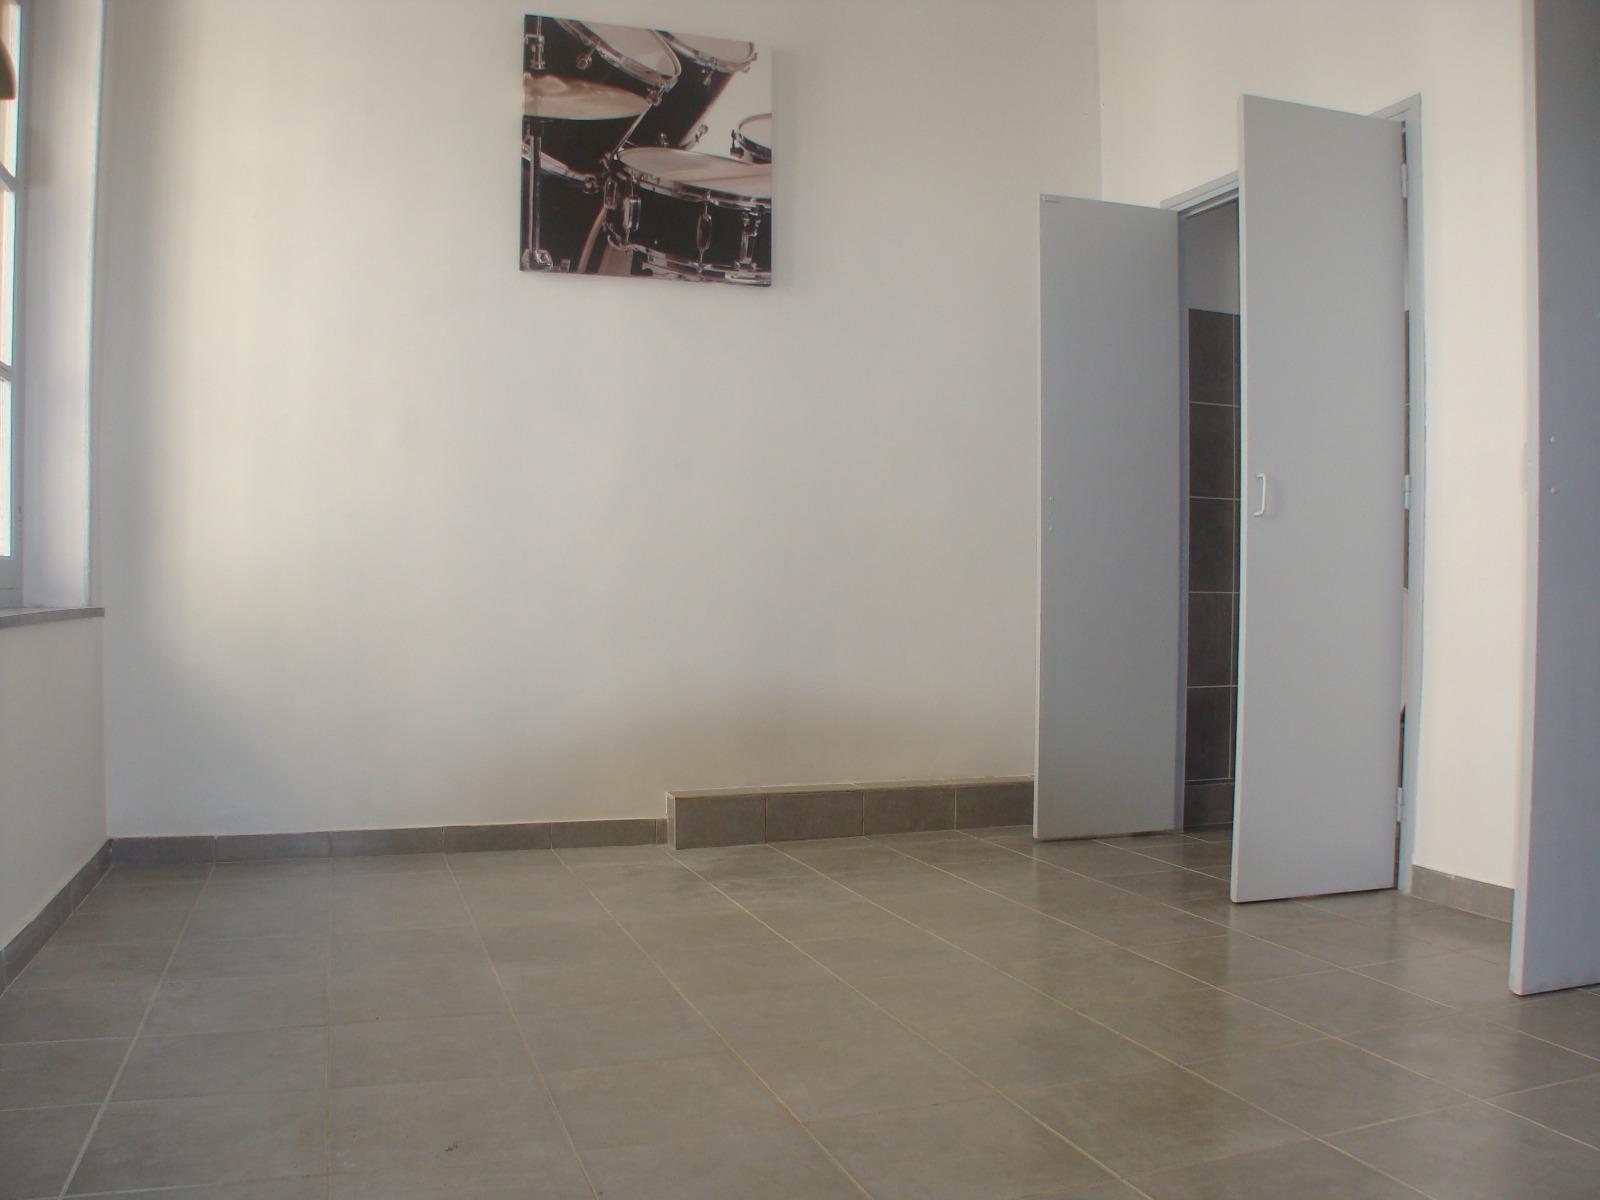 location studio r nov de 16 35 m sh centre ville. Black Bedroom Furniture Sets. Home Design Ideas